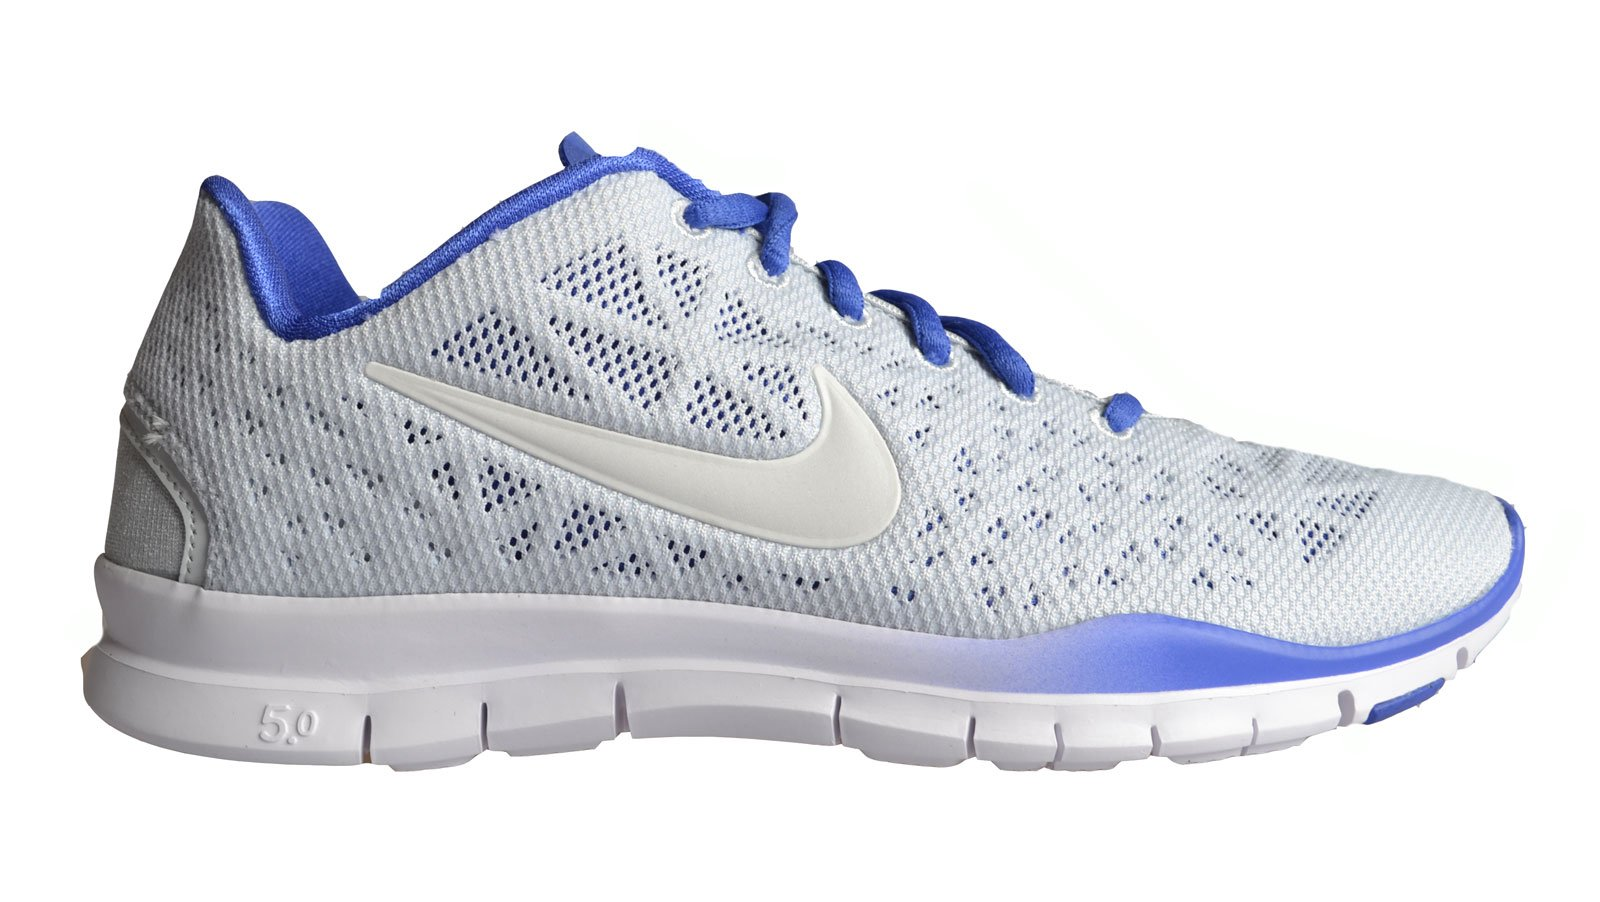 Billede af Nike Free Training Hypercool Fit Woman